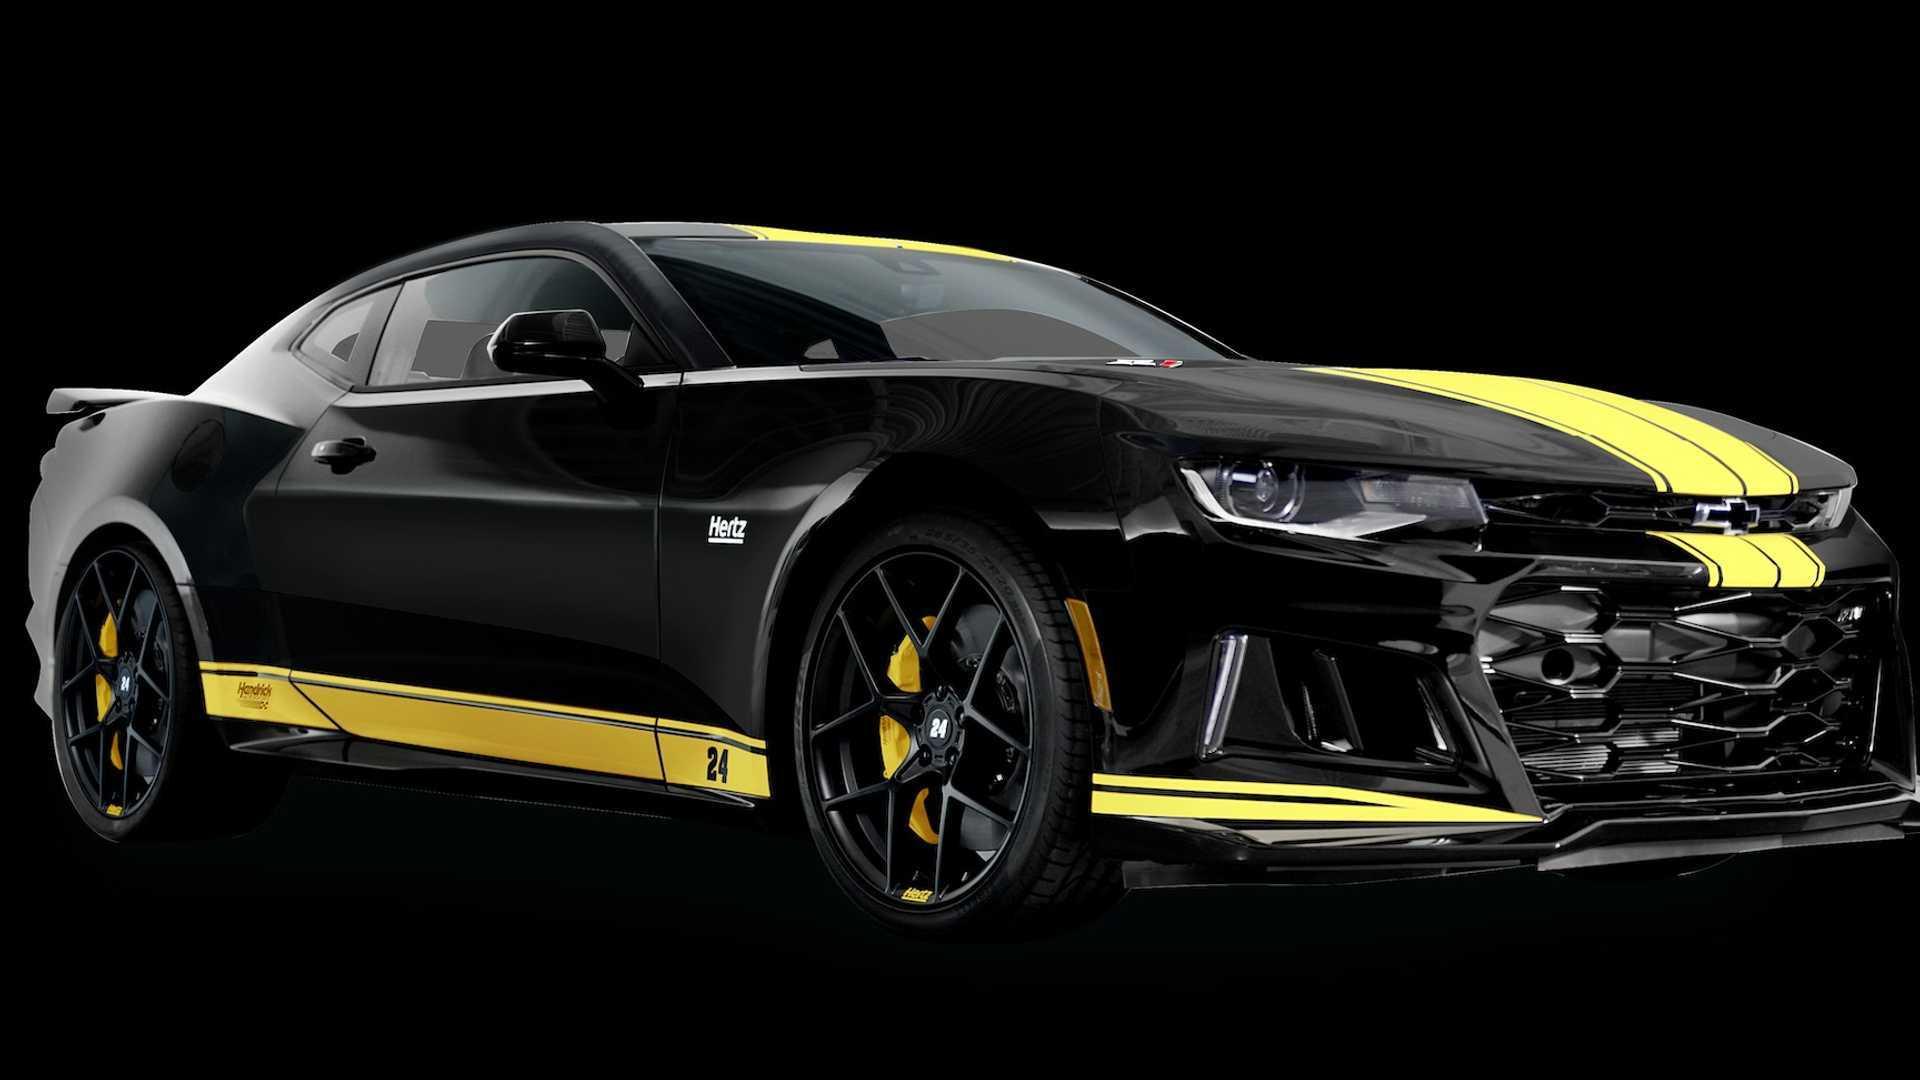 Hertz Full Size Car List 2020.You Can Rent A 750 Horsepower Camaro Zl1 Through Hertz